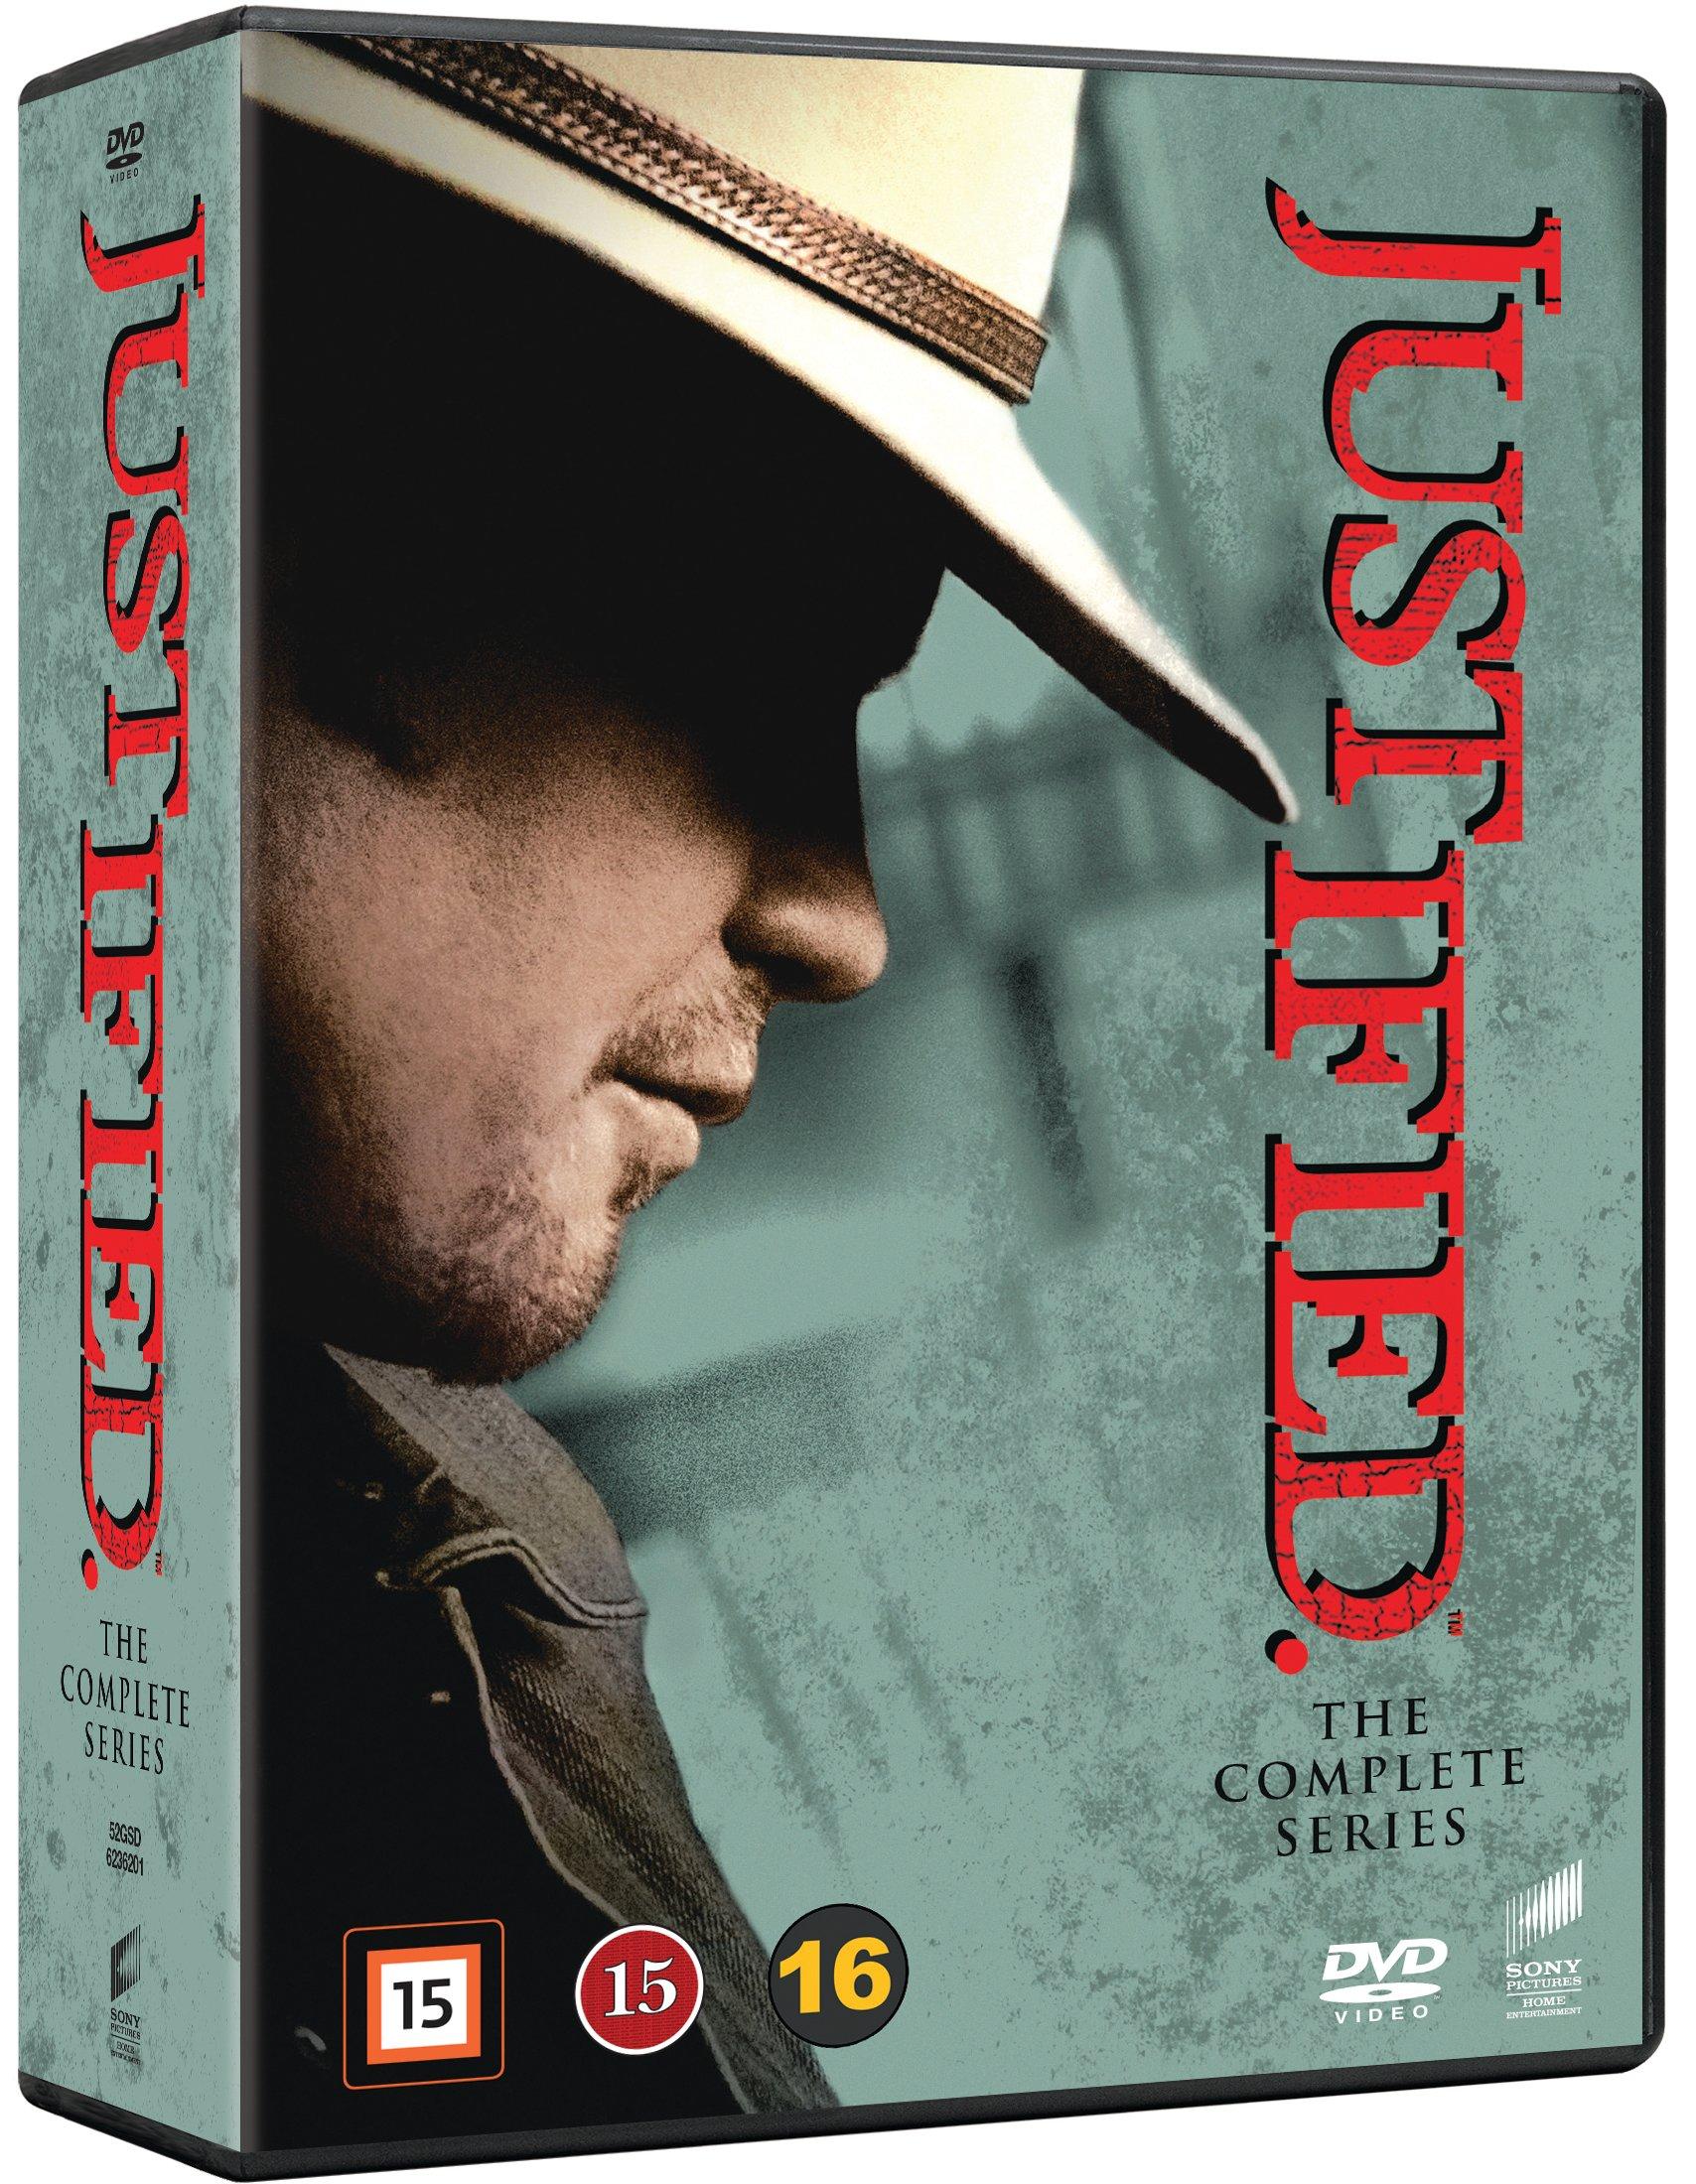 Justified: Complete Box - Season 1-6 (18 disc) - DVD